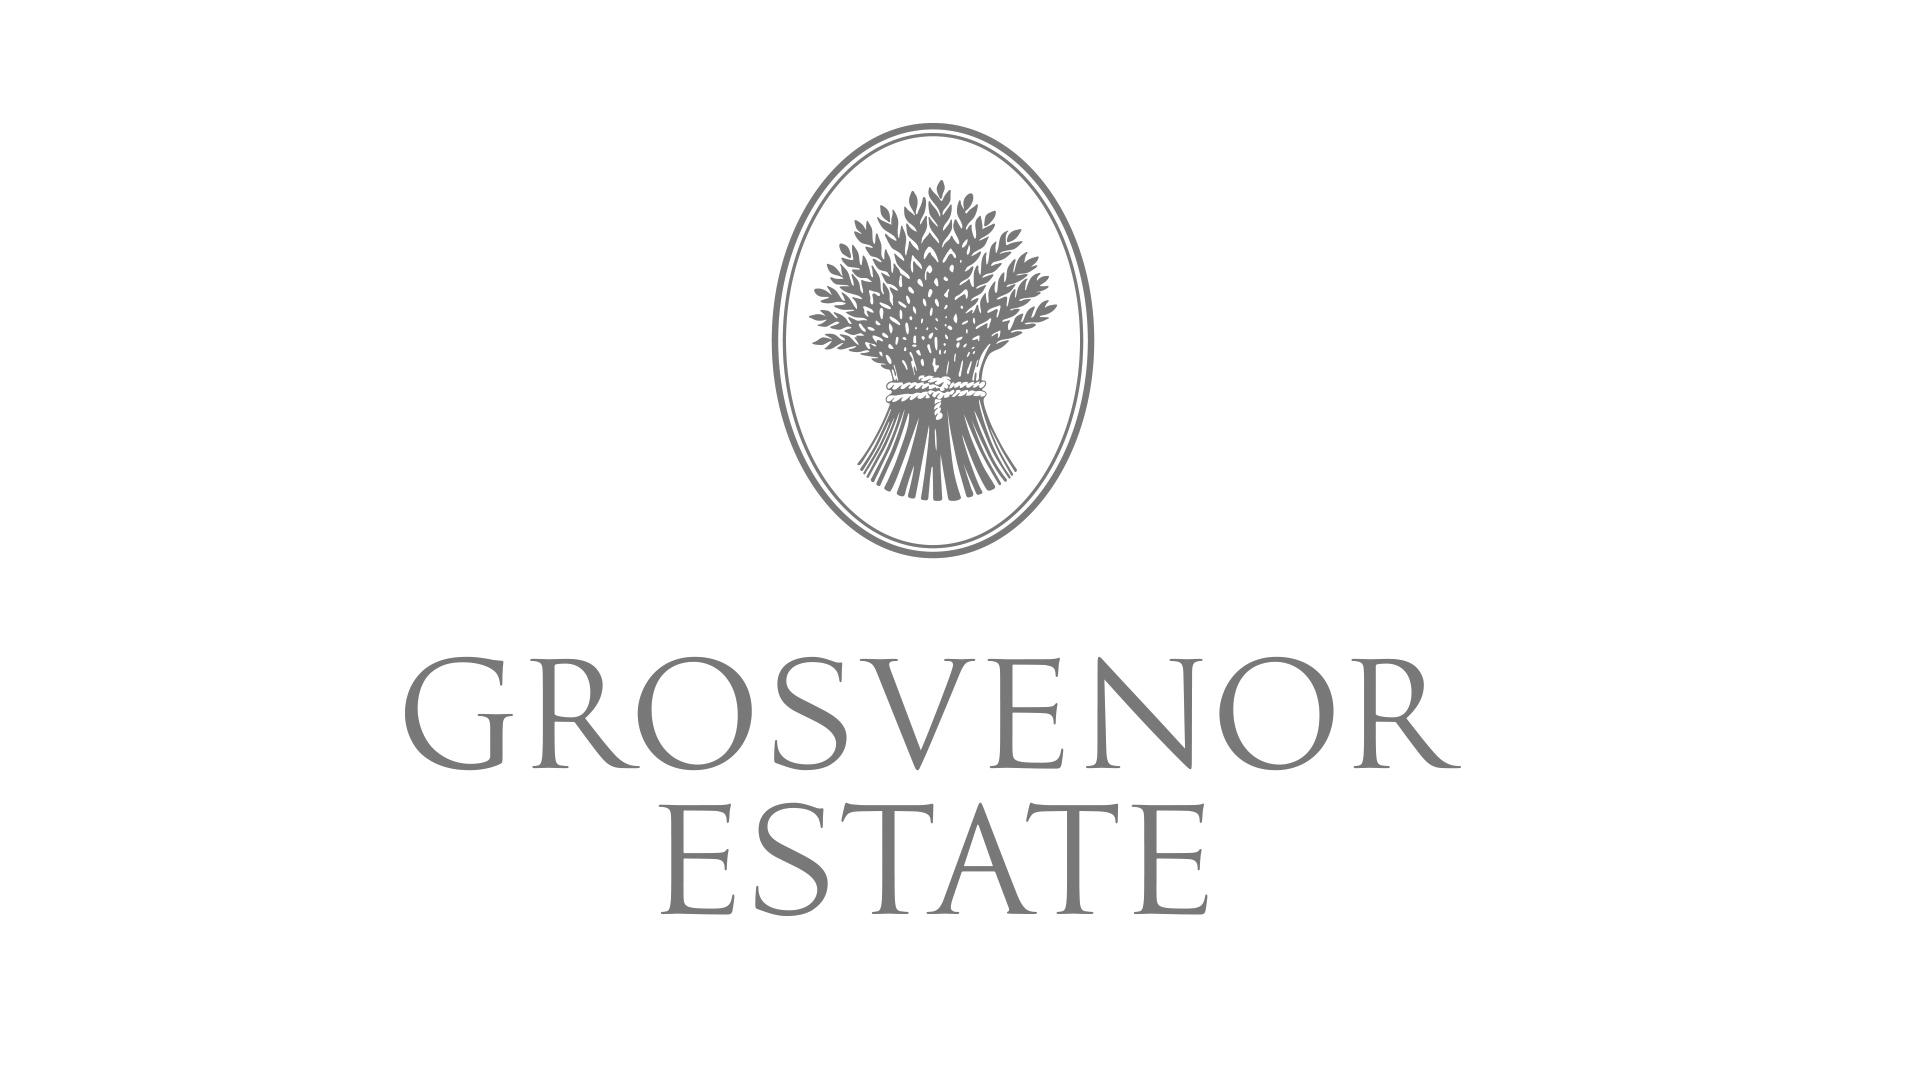 Daylight_client_Grosvenor_estate